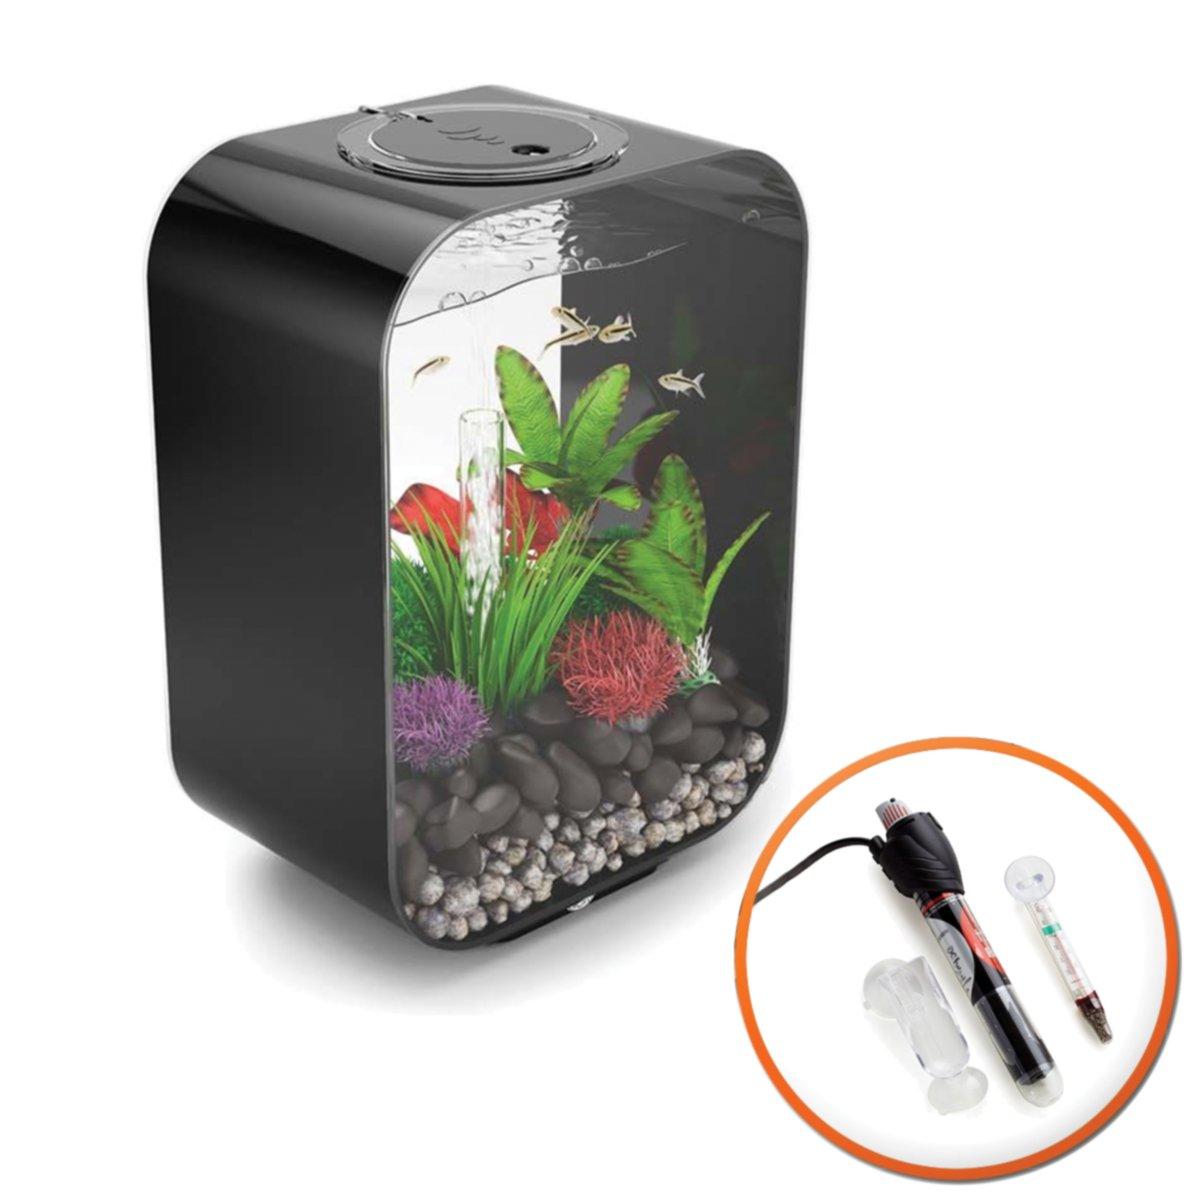 BiOrb Life 15L Black Tropical Aquarium with MCR LED Lighting and Heat Pack